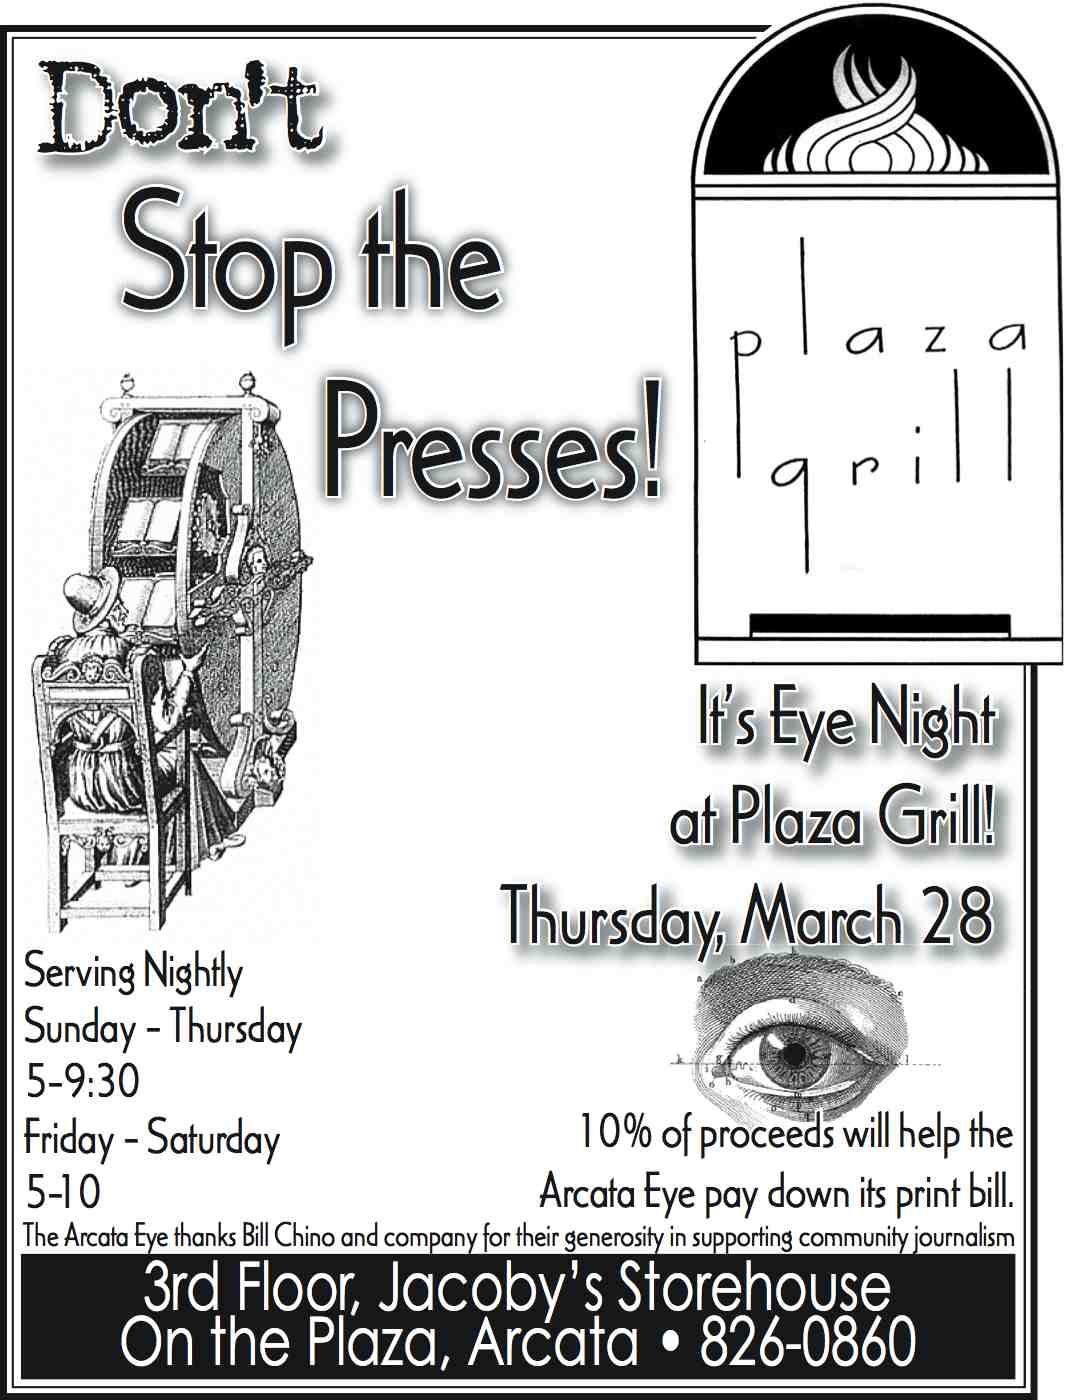 plaza-grill-eye-night